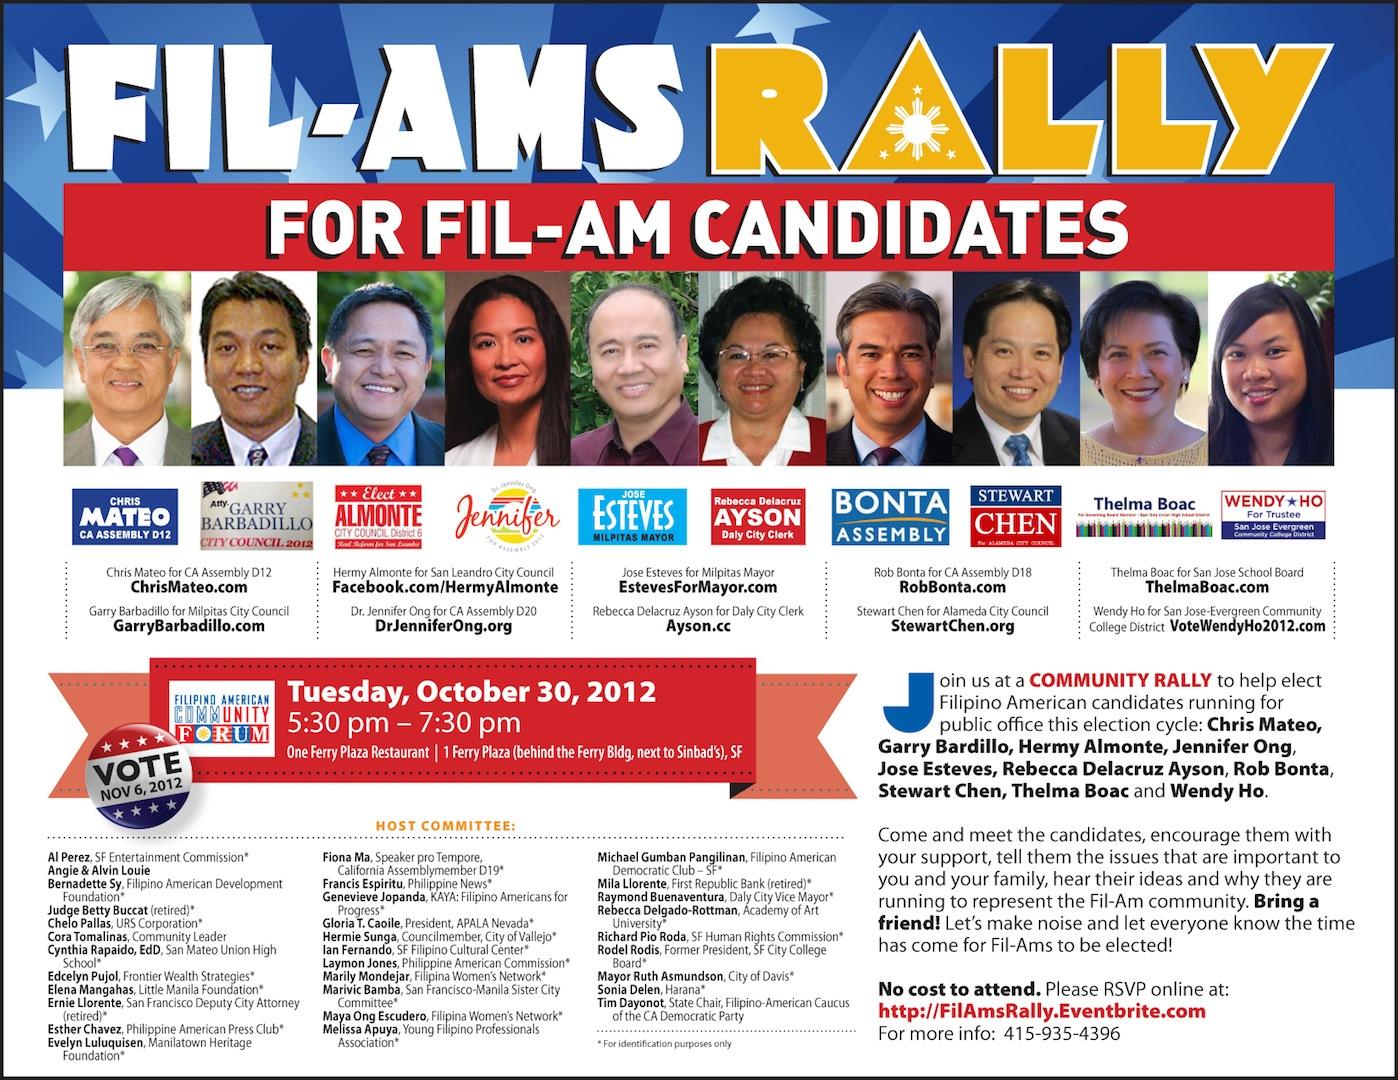 FilAms Rally FilAm Candidates